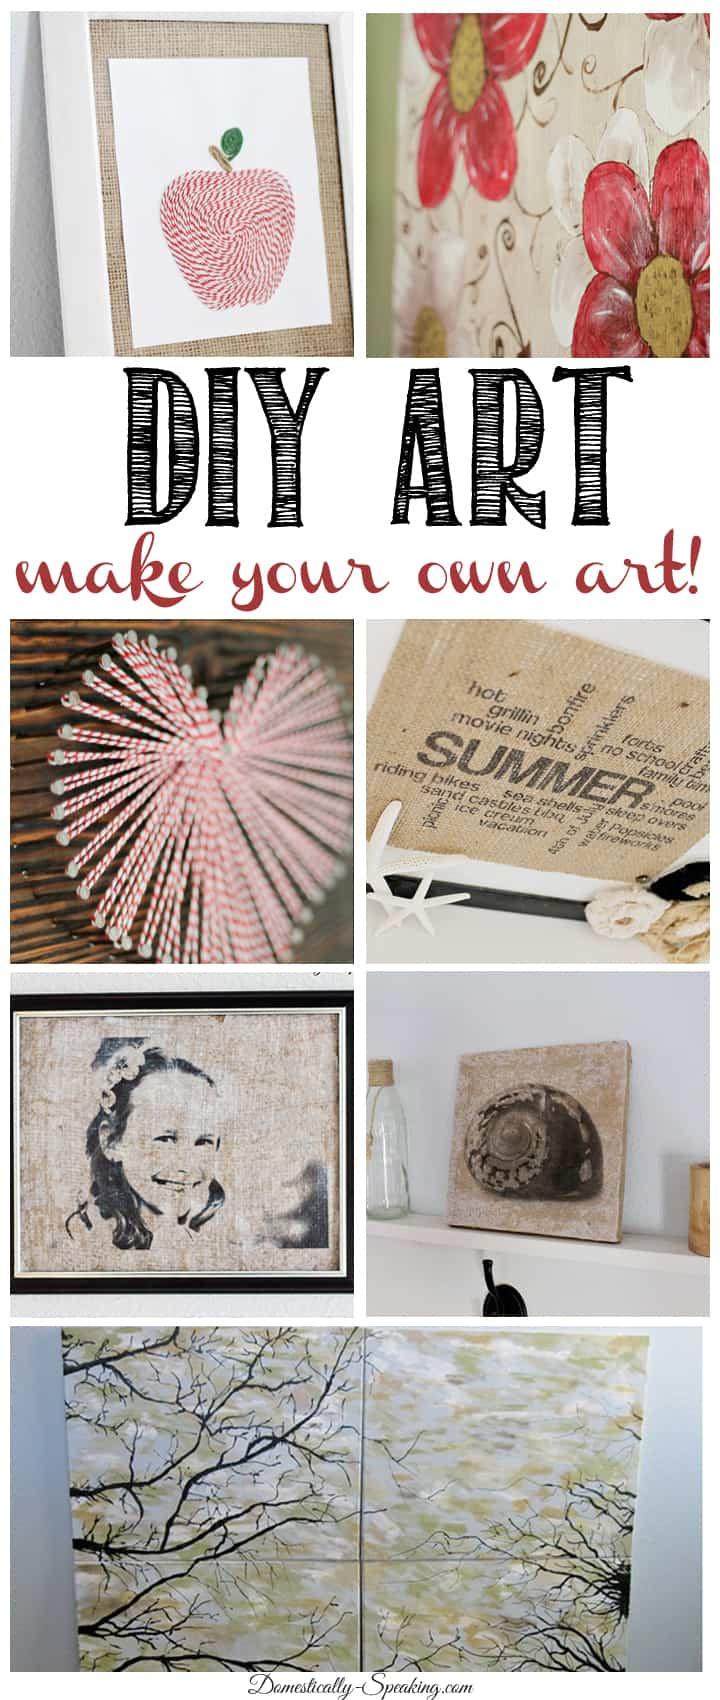 DIY Art make your own artwork